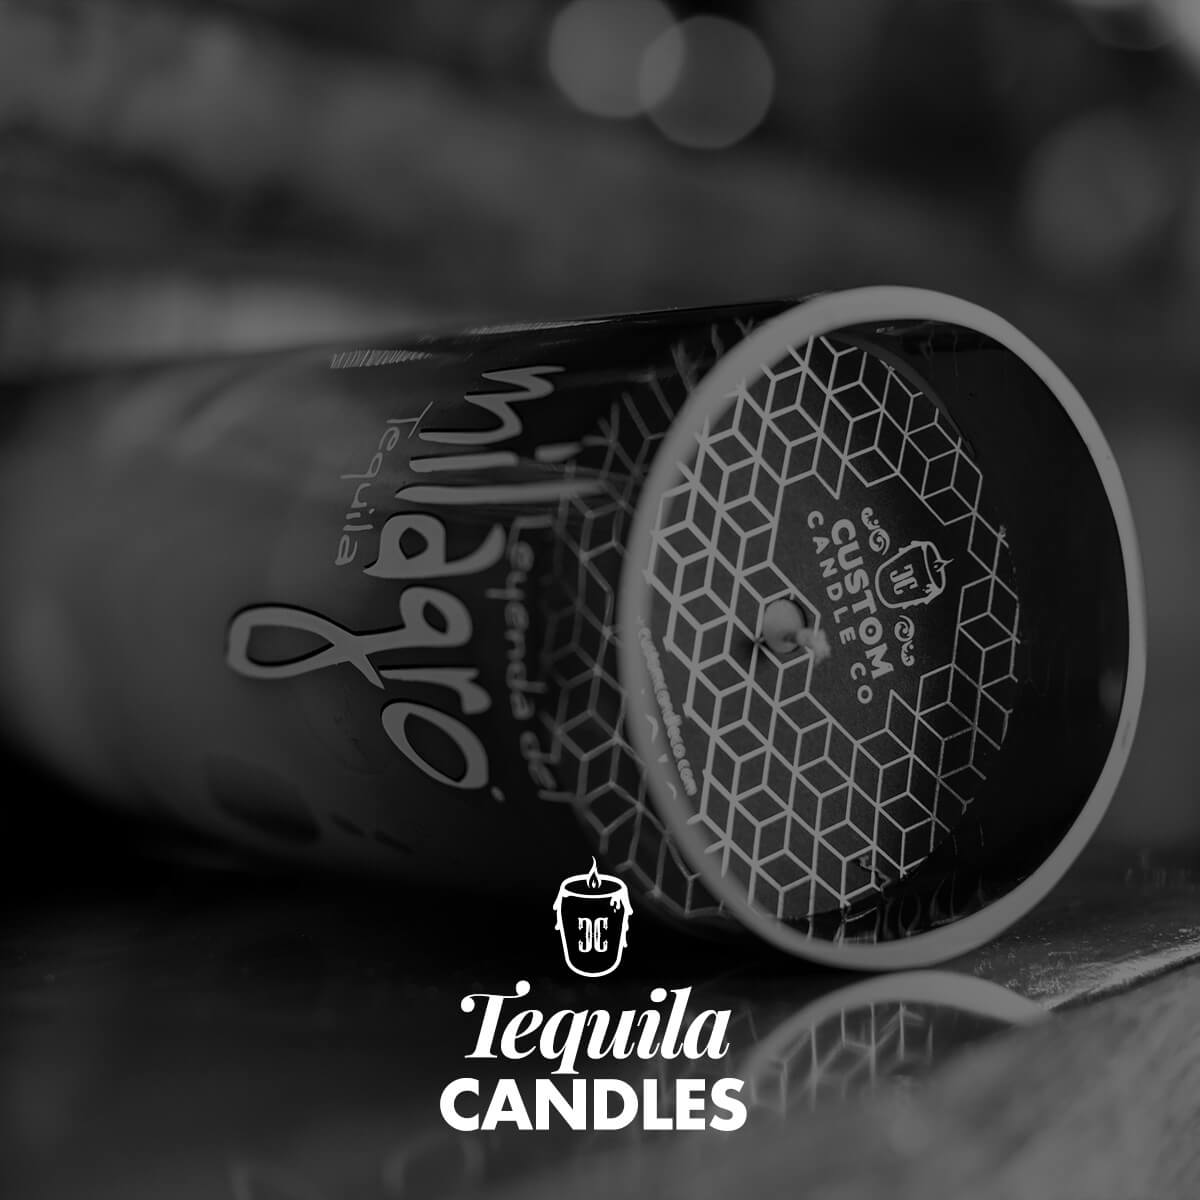 tequila-candles-customcandleco-1